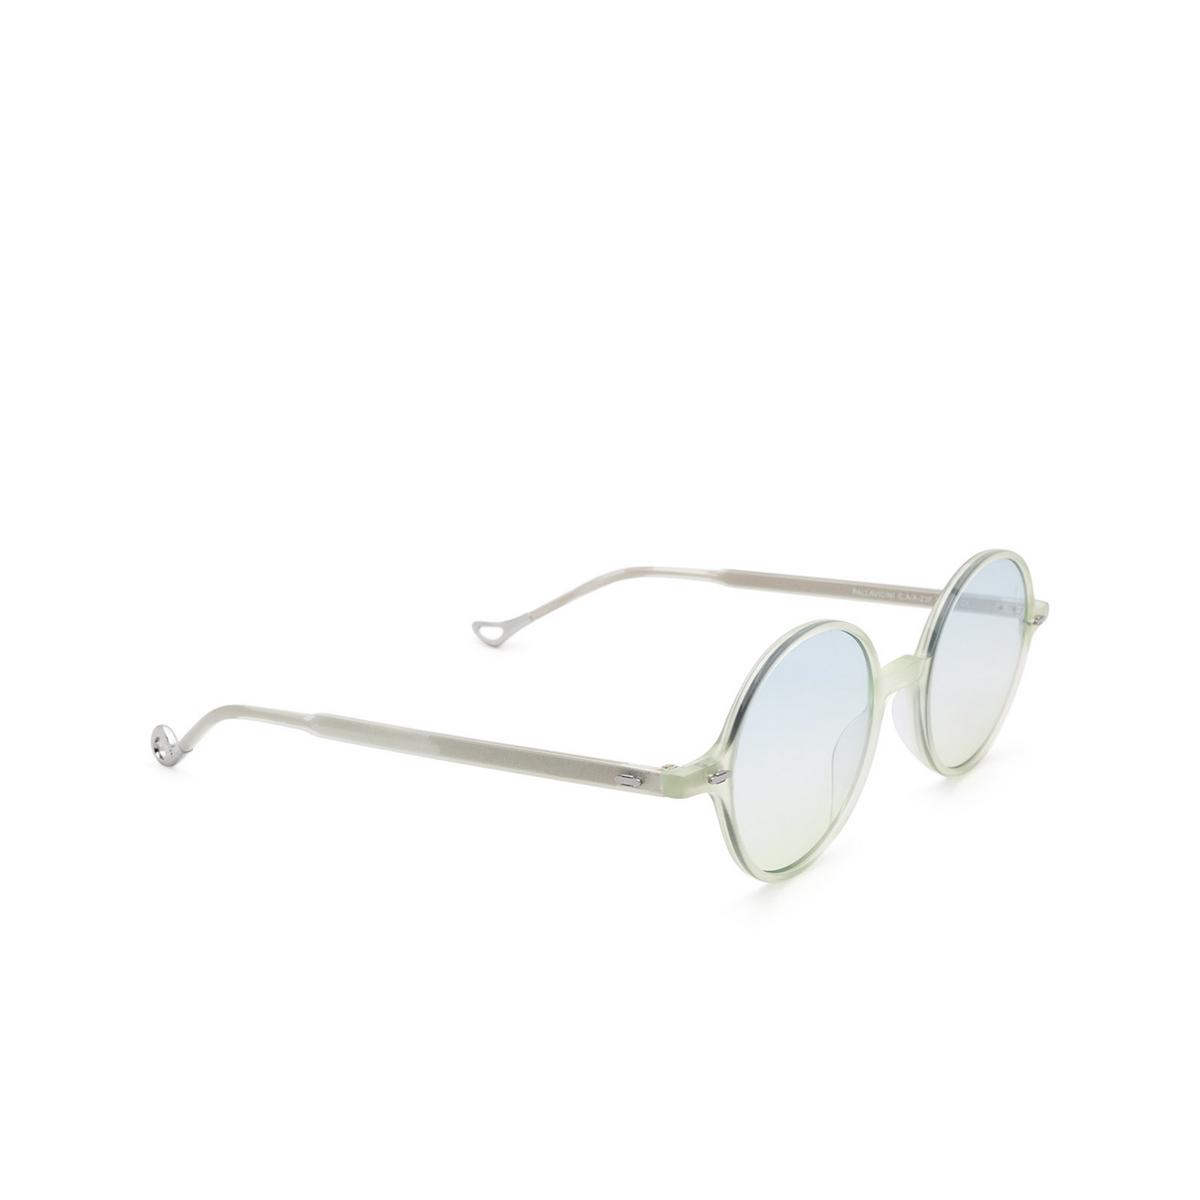 Eyepetizer® Round Sunglasses: Pallavicini color Green Aqua Marine C.A/A-23F - three-quarters view.